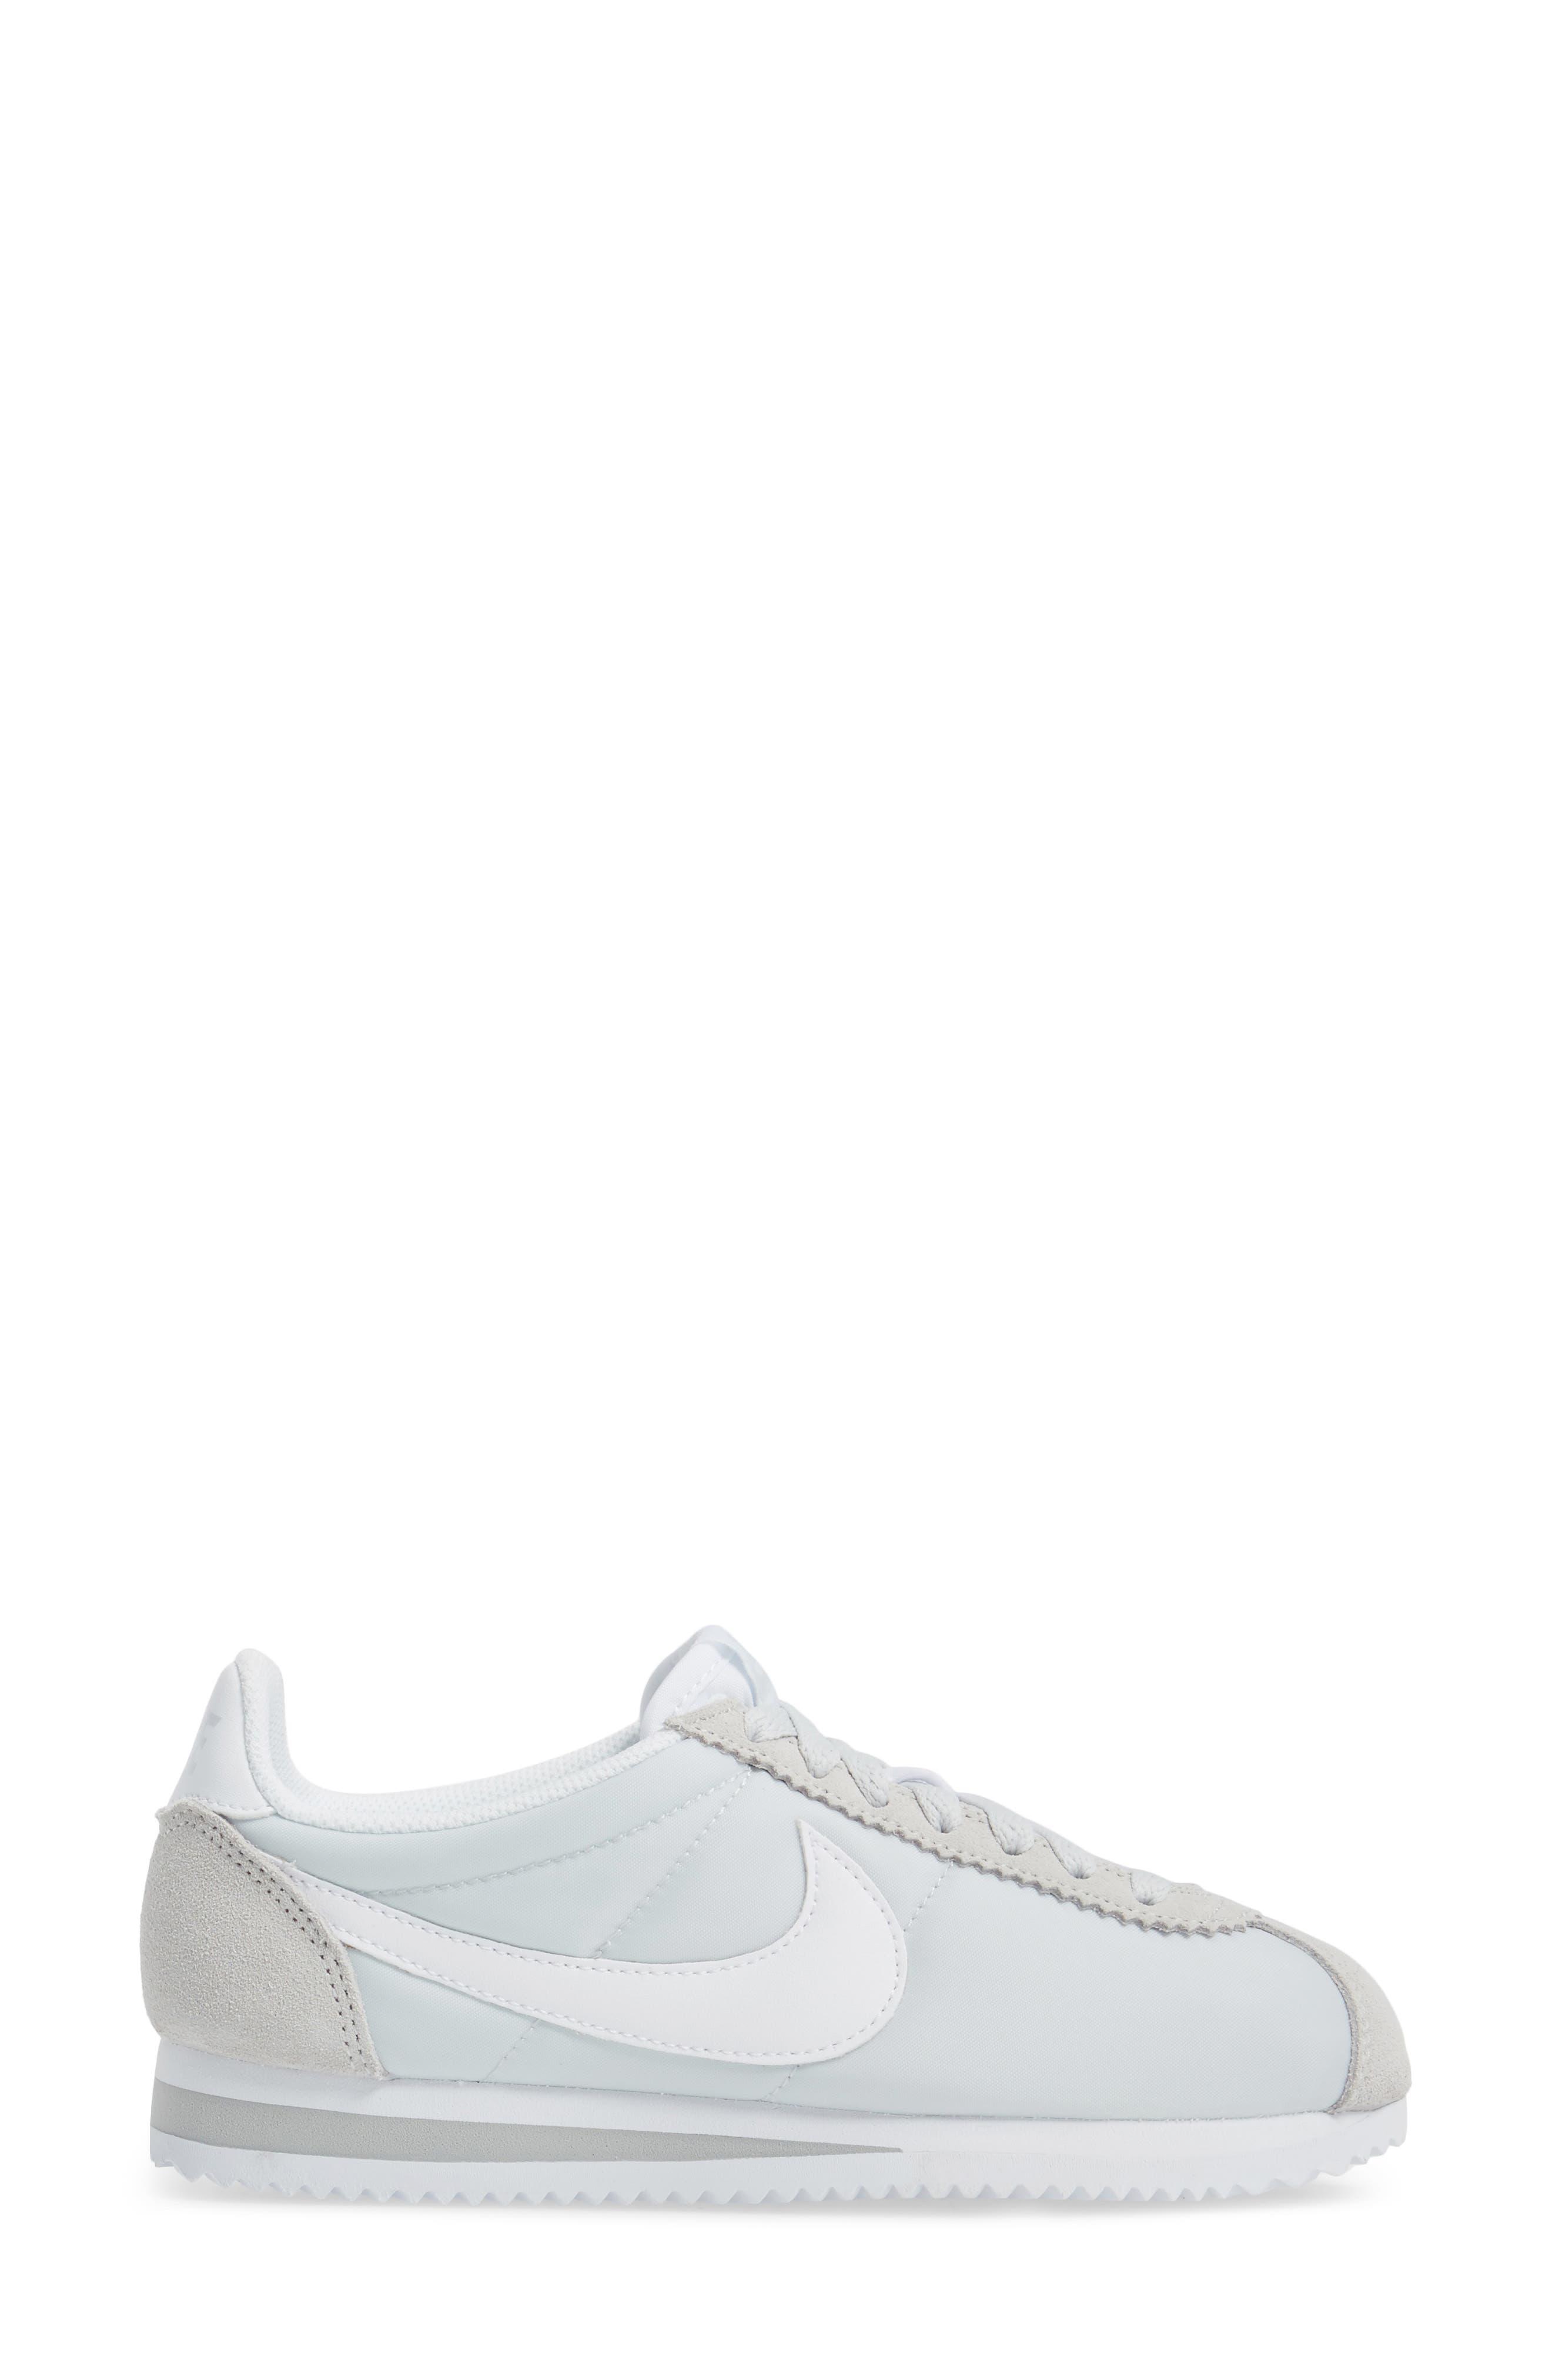 'Classic Cortez' Sneaker,                             Alternate thumbnail 3, color,                             Pure Platinum/ White